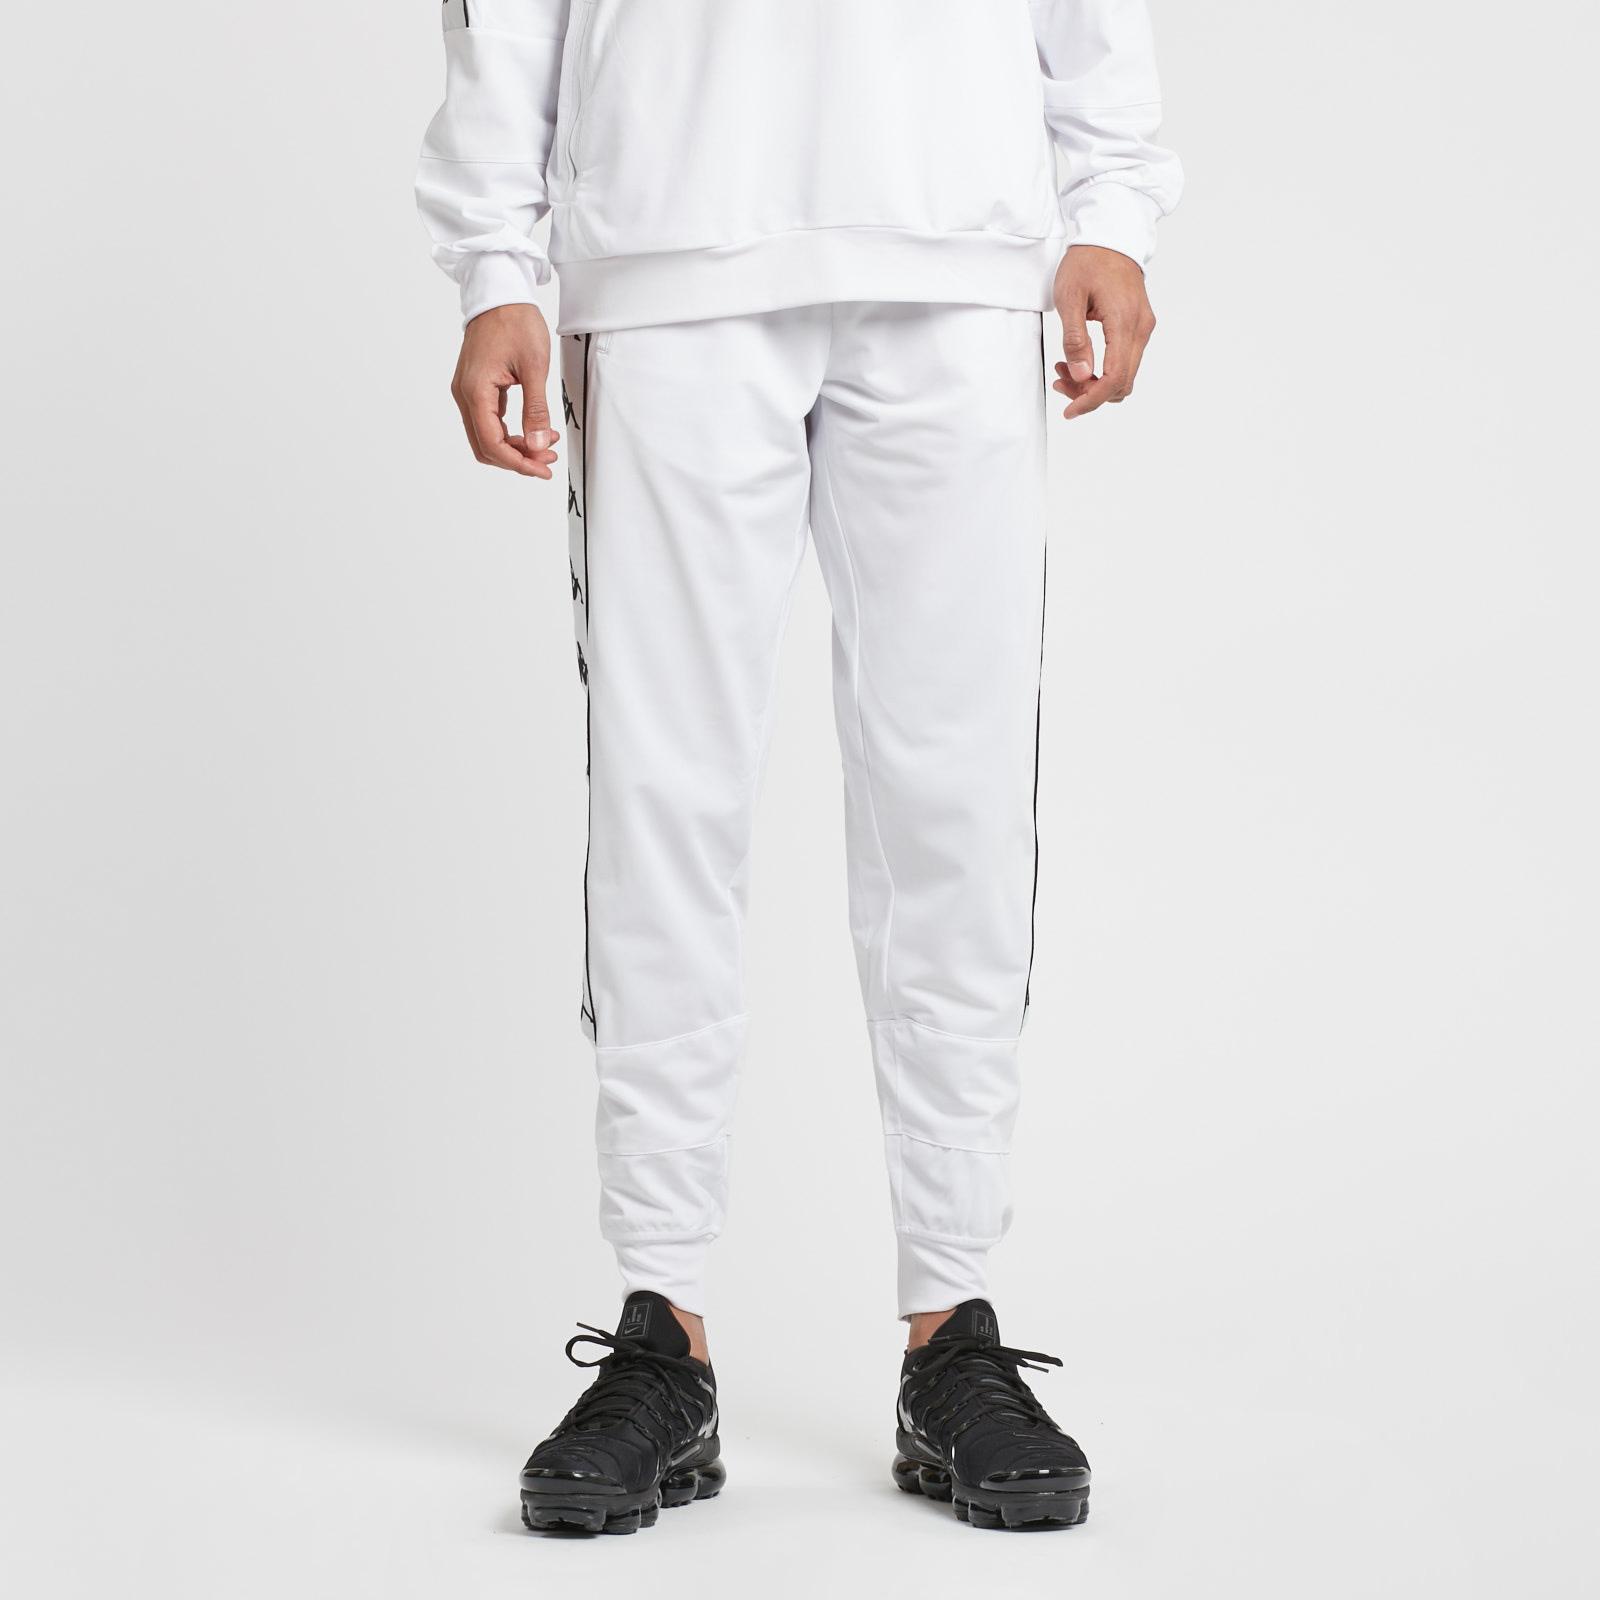 Kappa kontroll blueprint pants 303yni0 wht sneakersnstuff kappa kontroll blueprint pants malvernweather Image collections